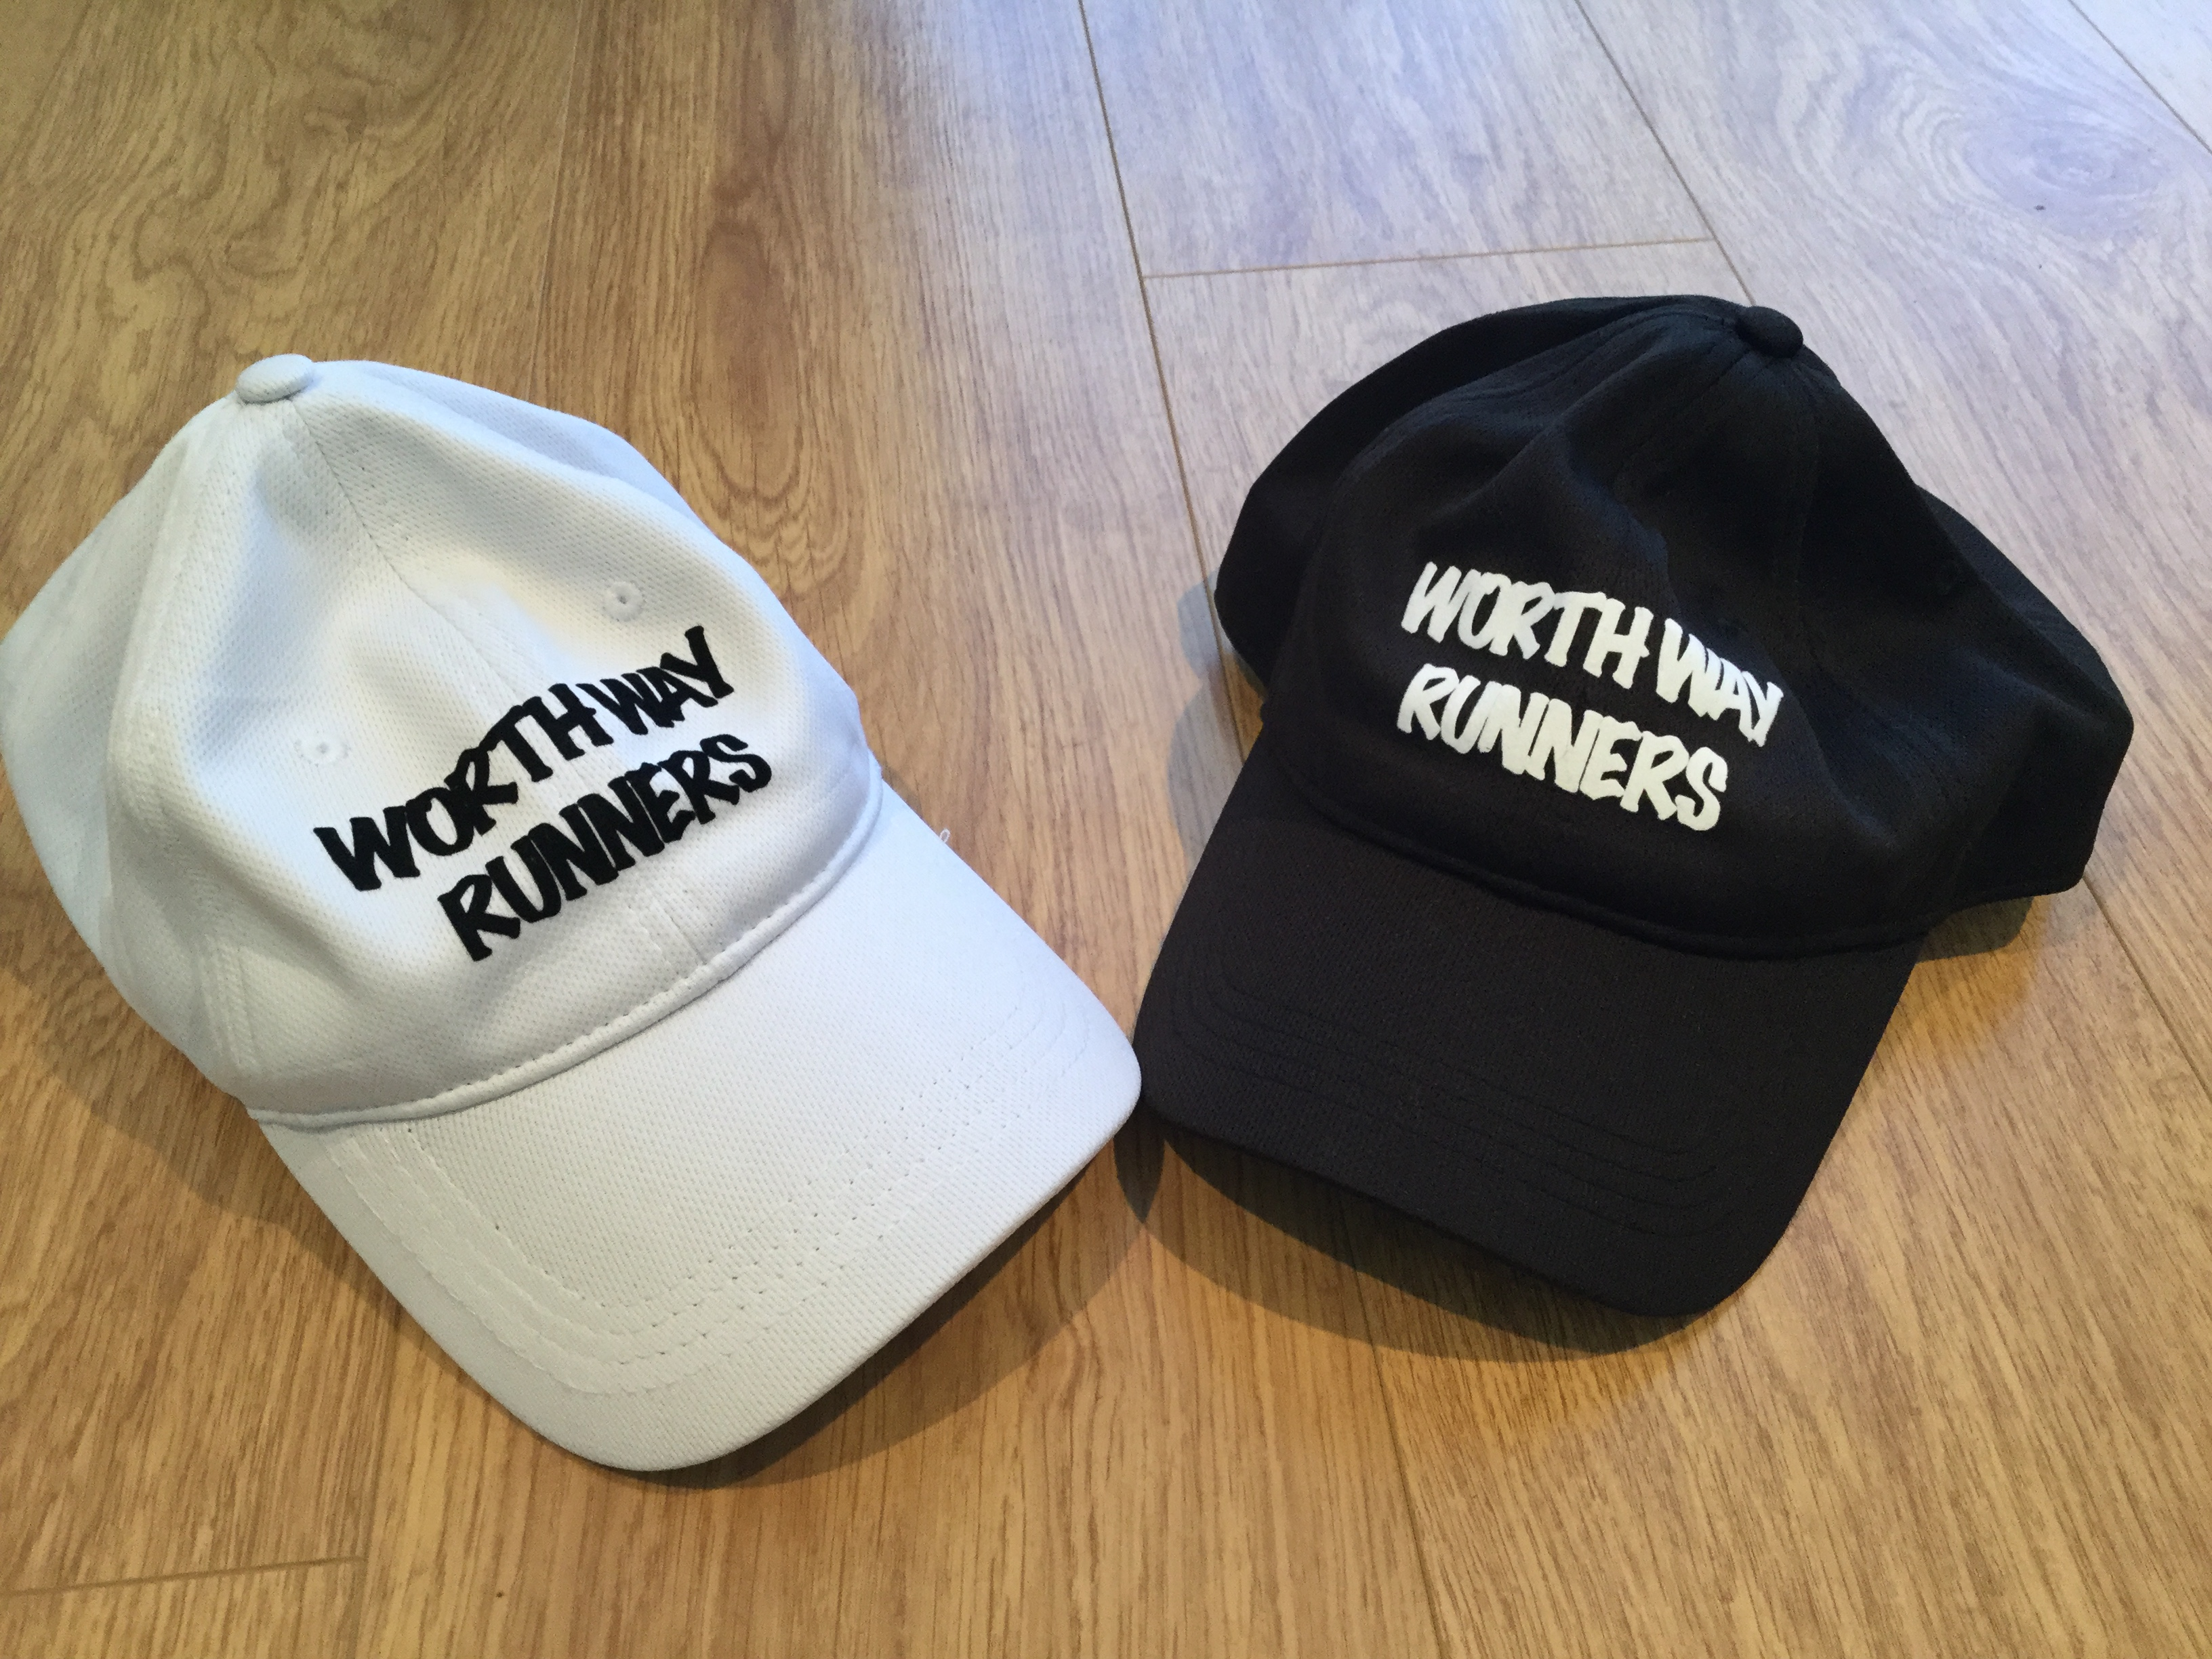 Worth Way Runners - Hat